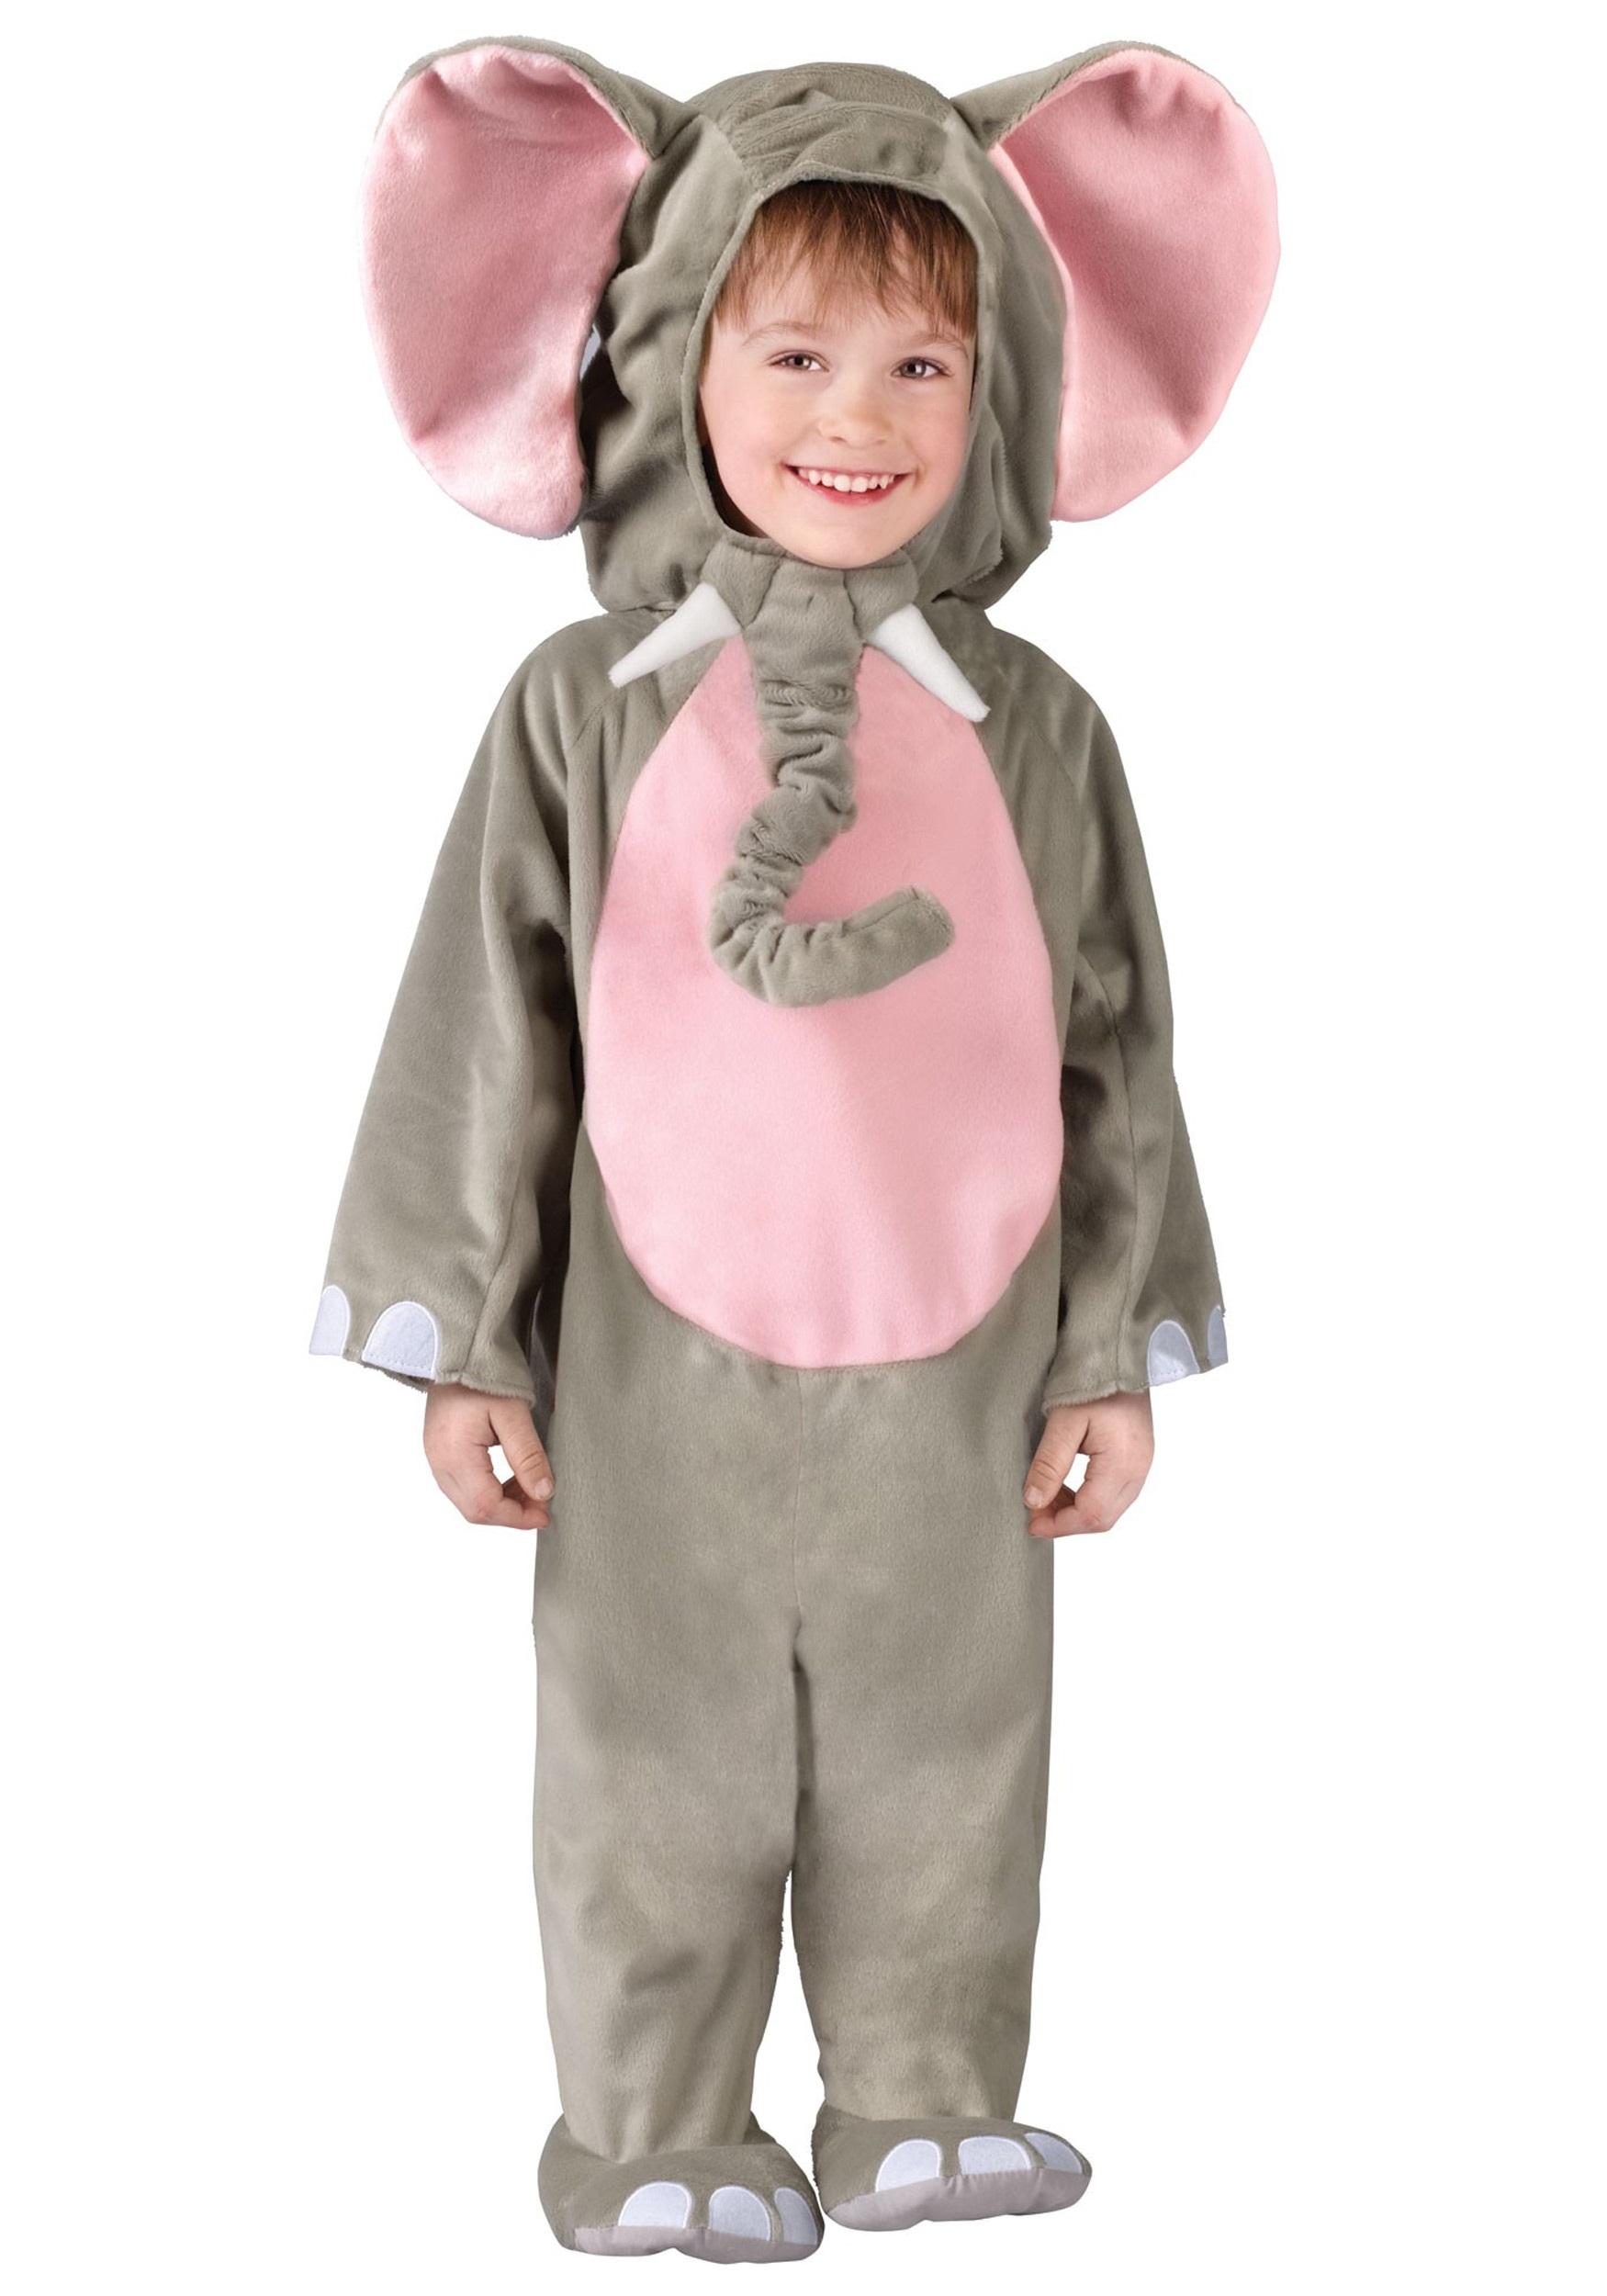 costume elephant toddler costumes animal halloween baby toddlers 3t google halloweencostumes fun infant